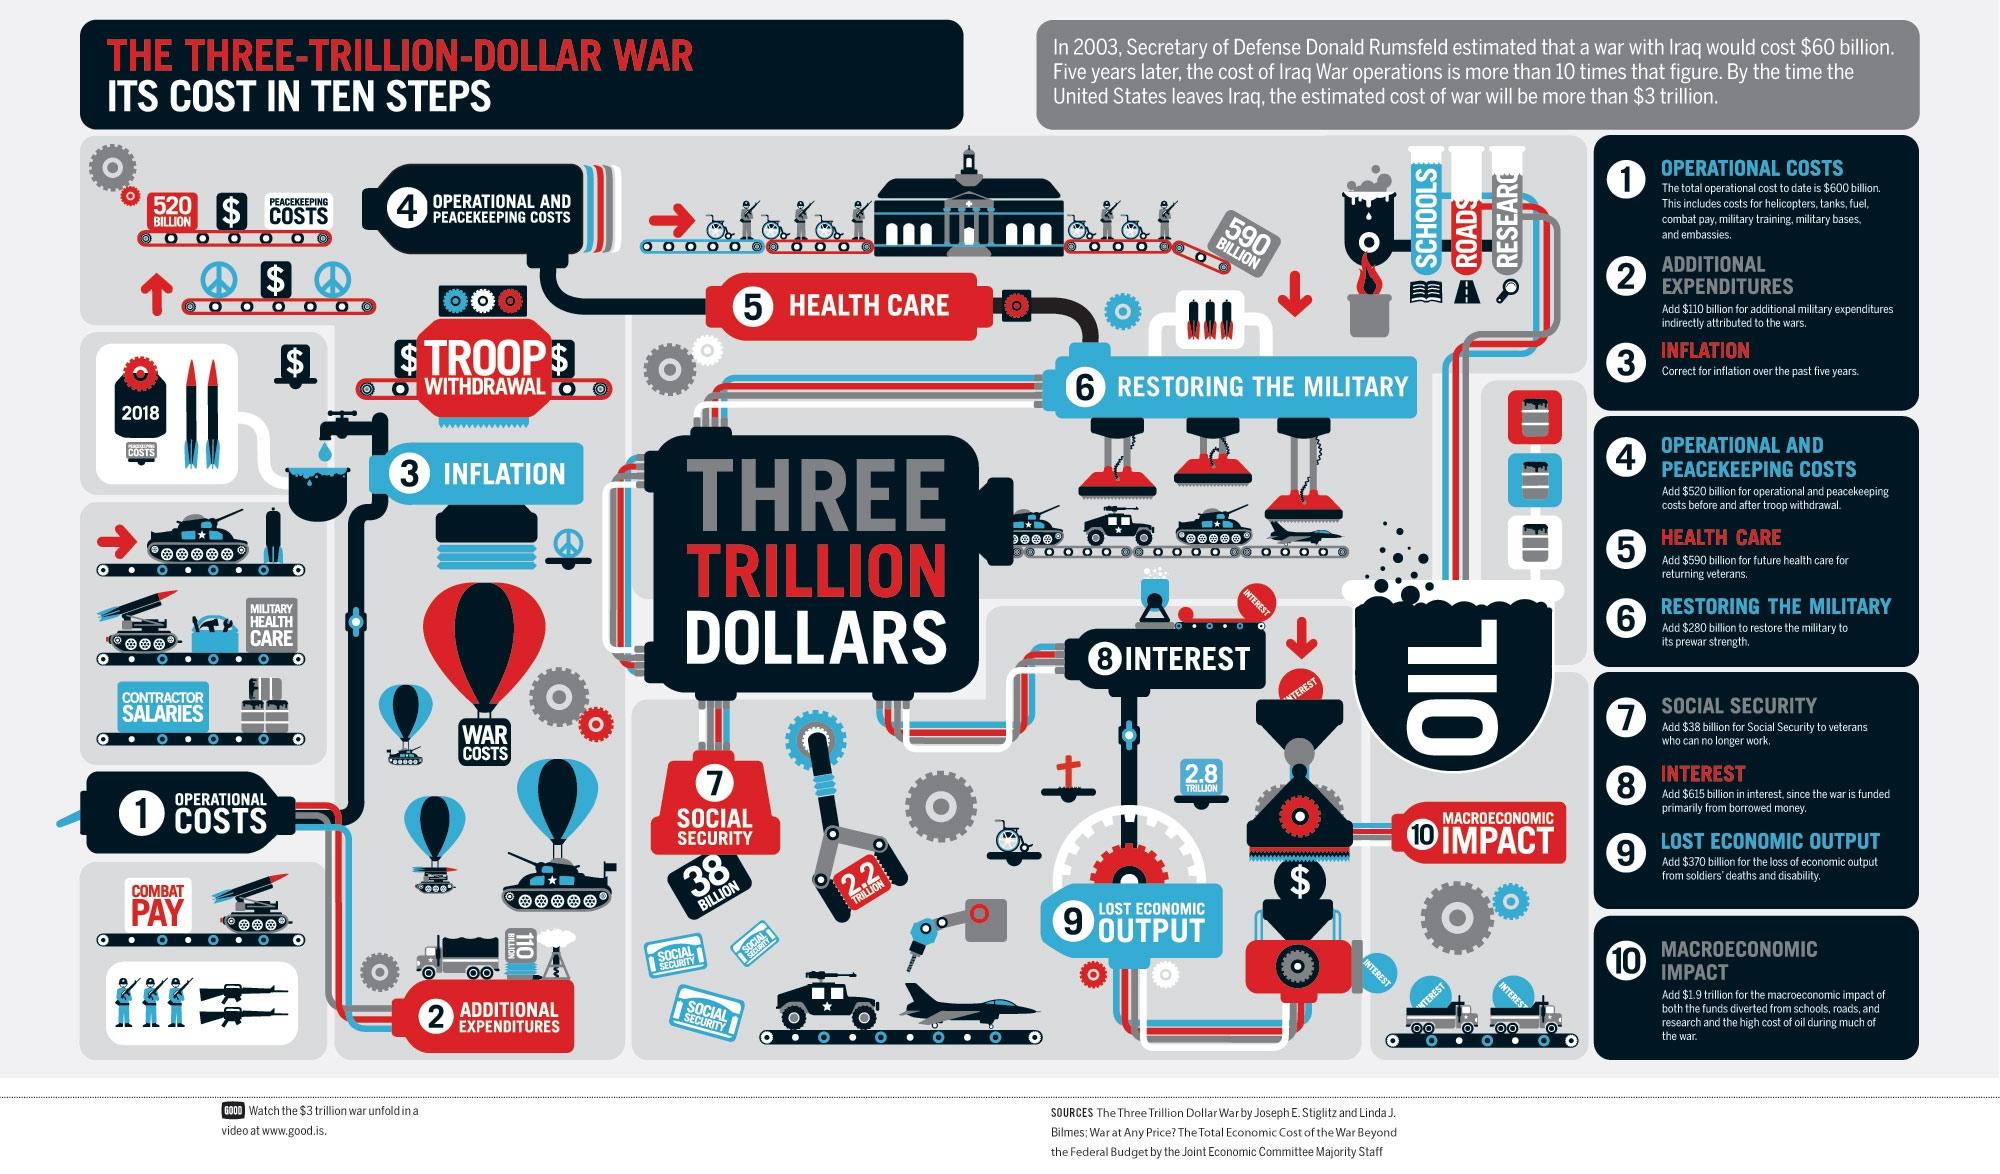 http://www.ritholtz.com/blog/wp-content/uploads/2011/01/threetrilliondollarwar.jpg